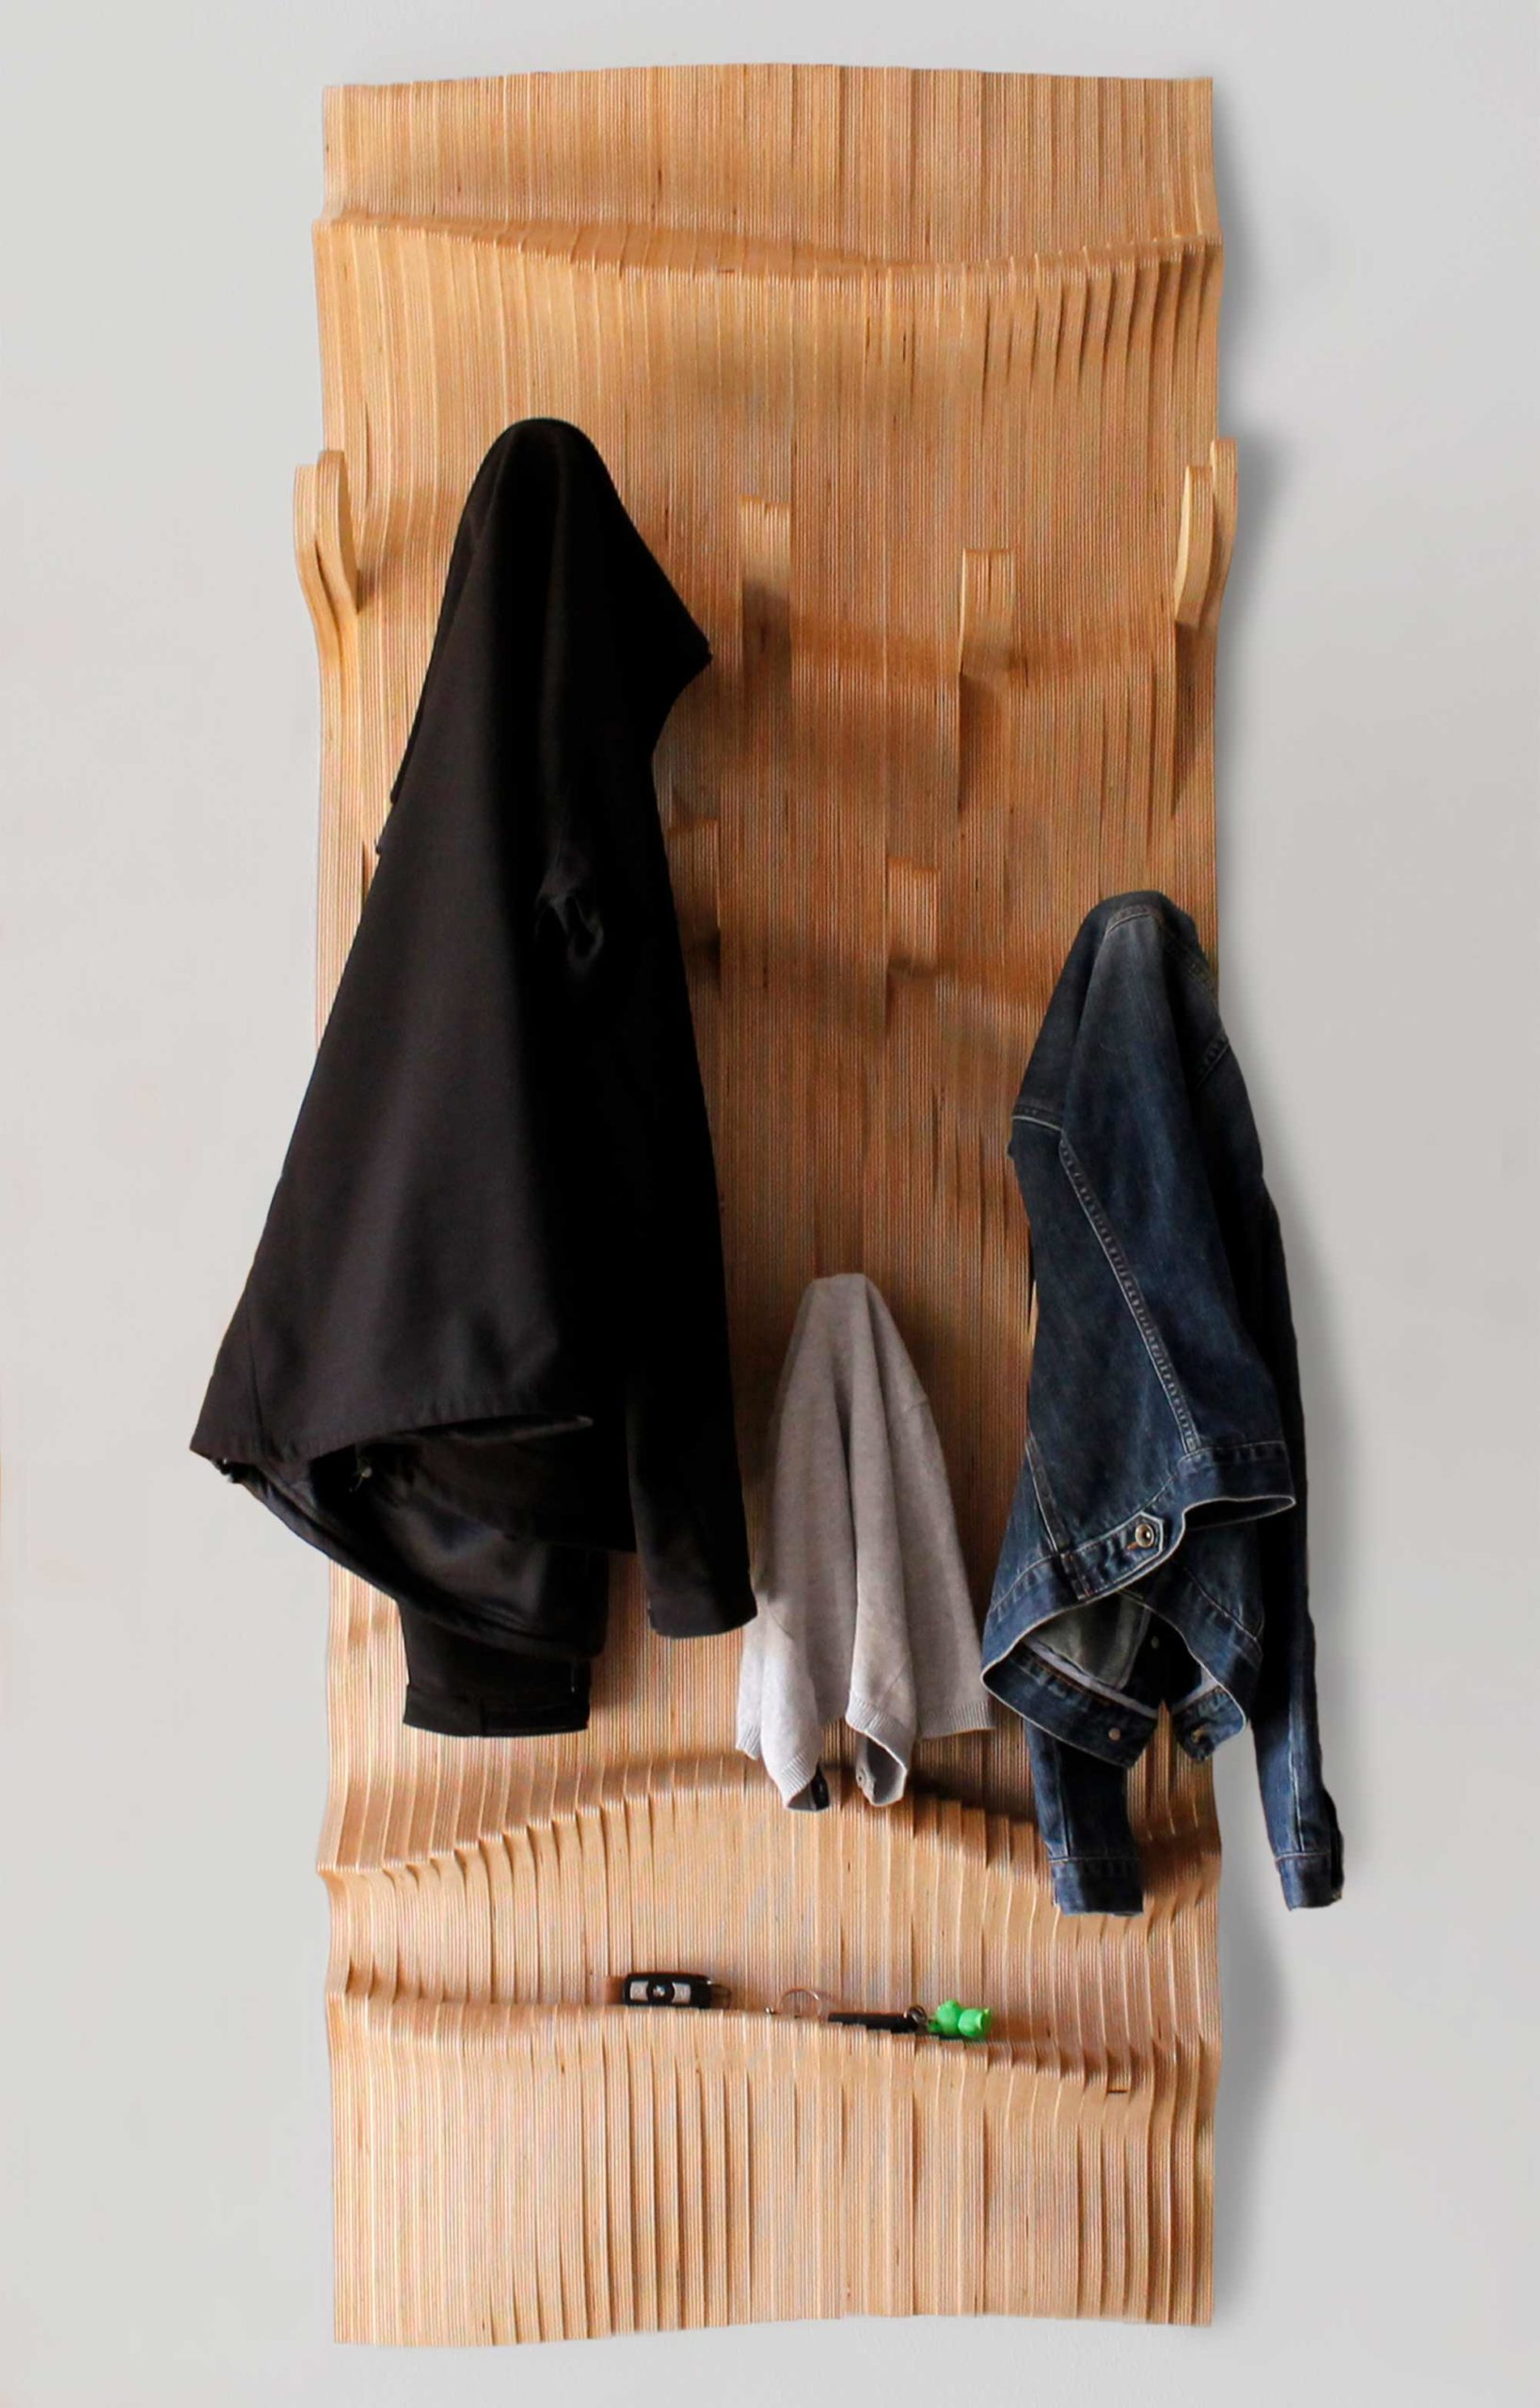 EX-Hanger_-Diseño-_-EXarchitects_04